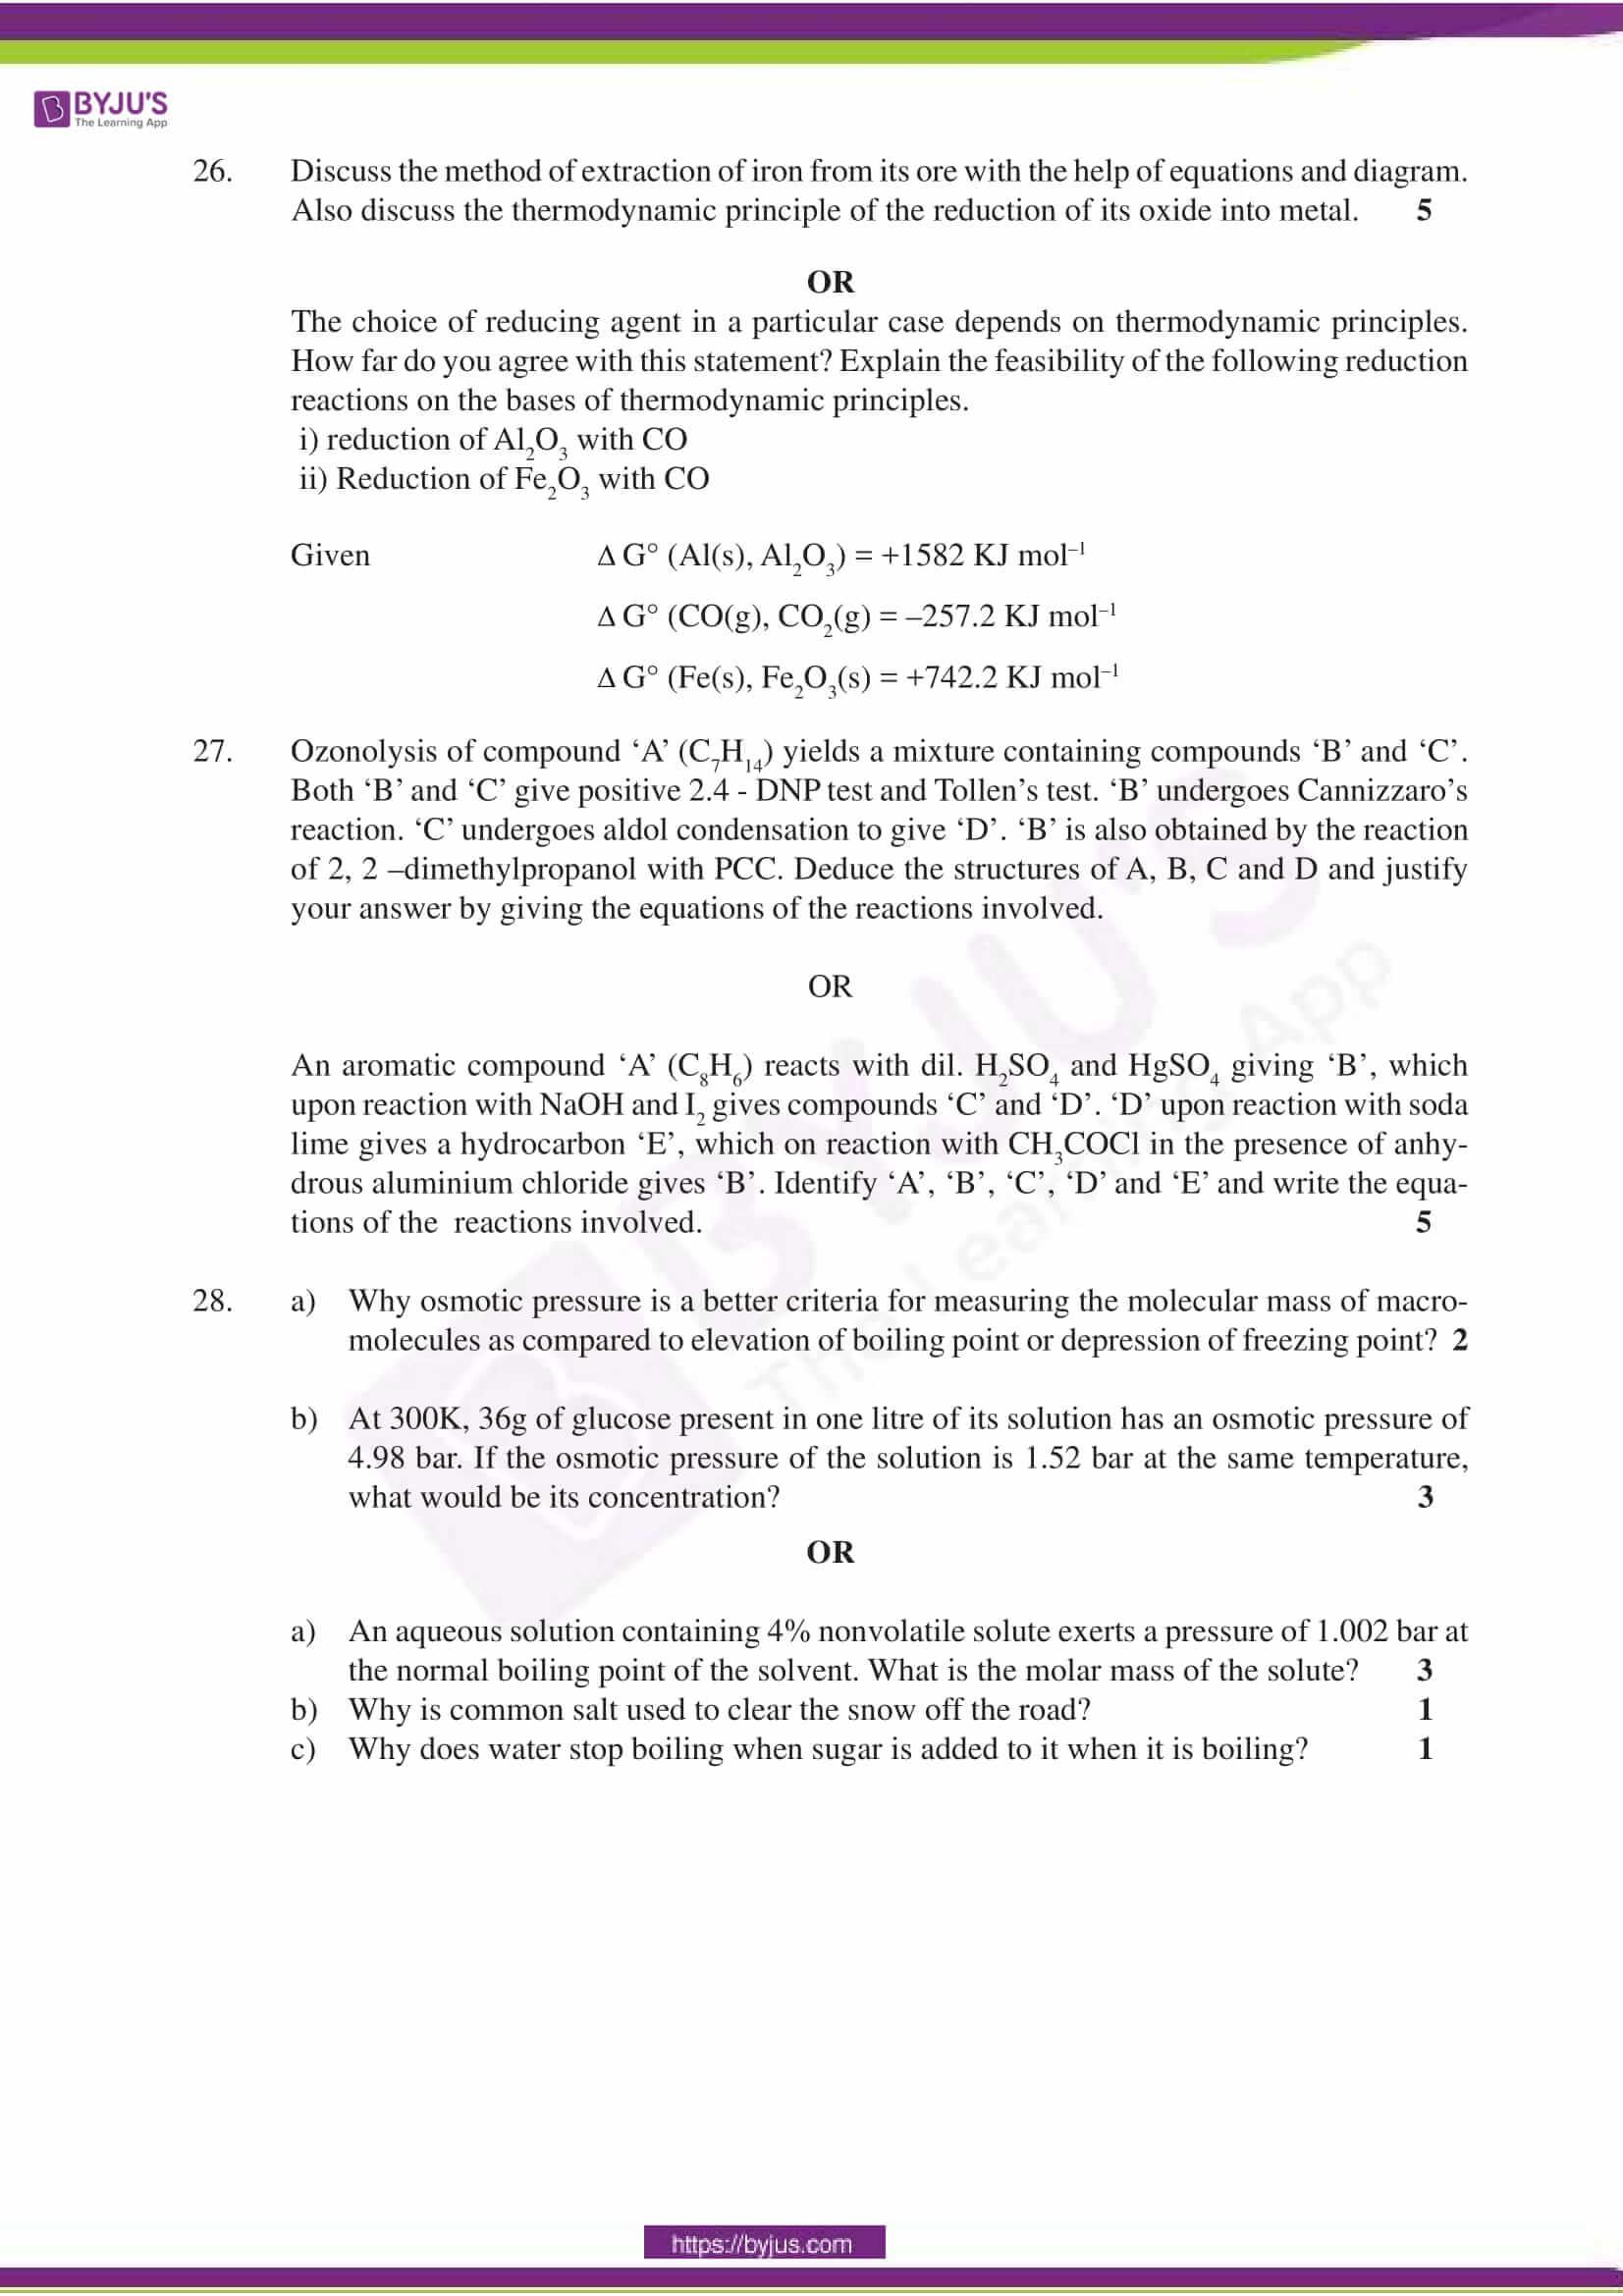 cbse sample paper class 12 chemistry set 7